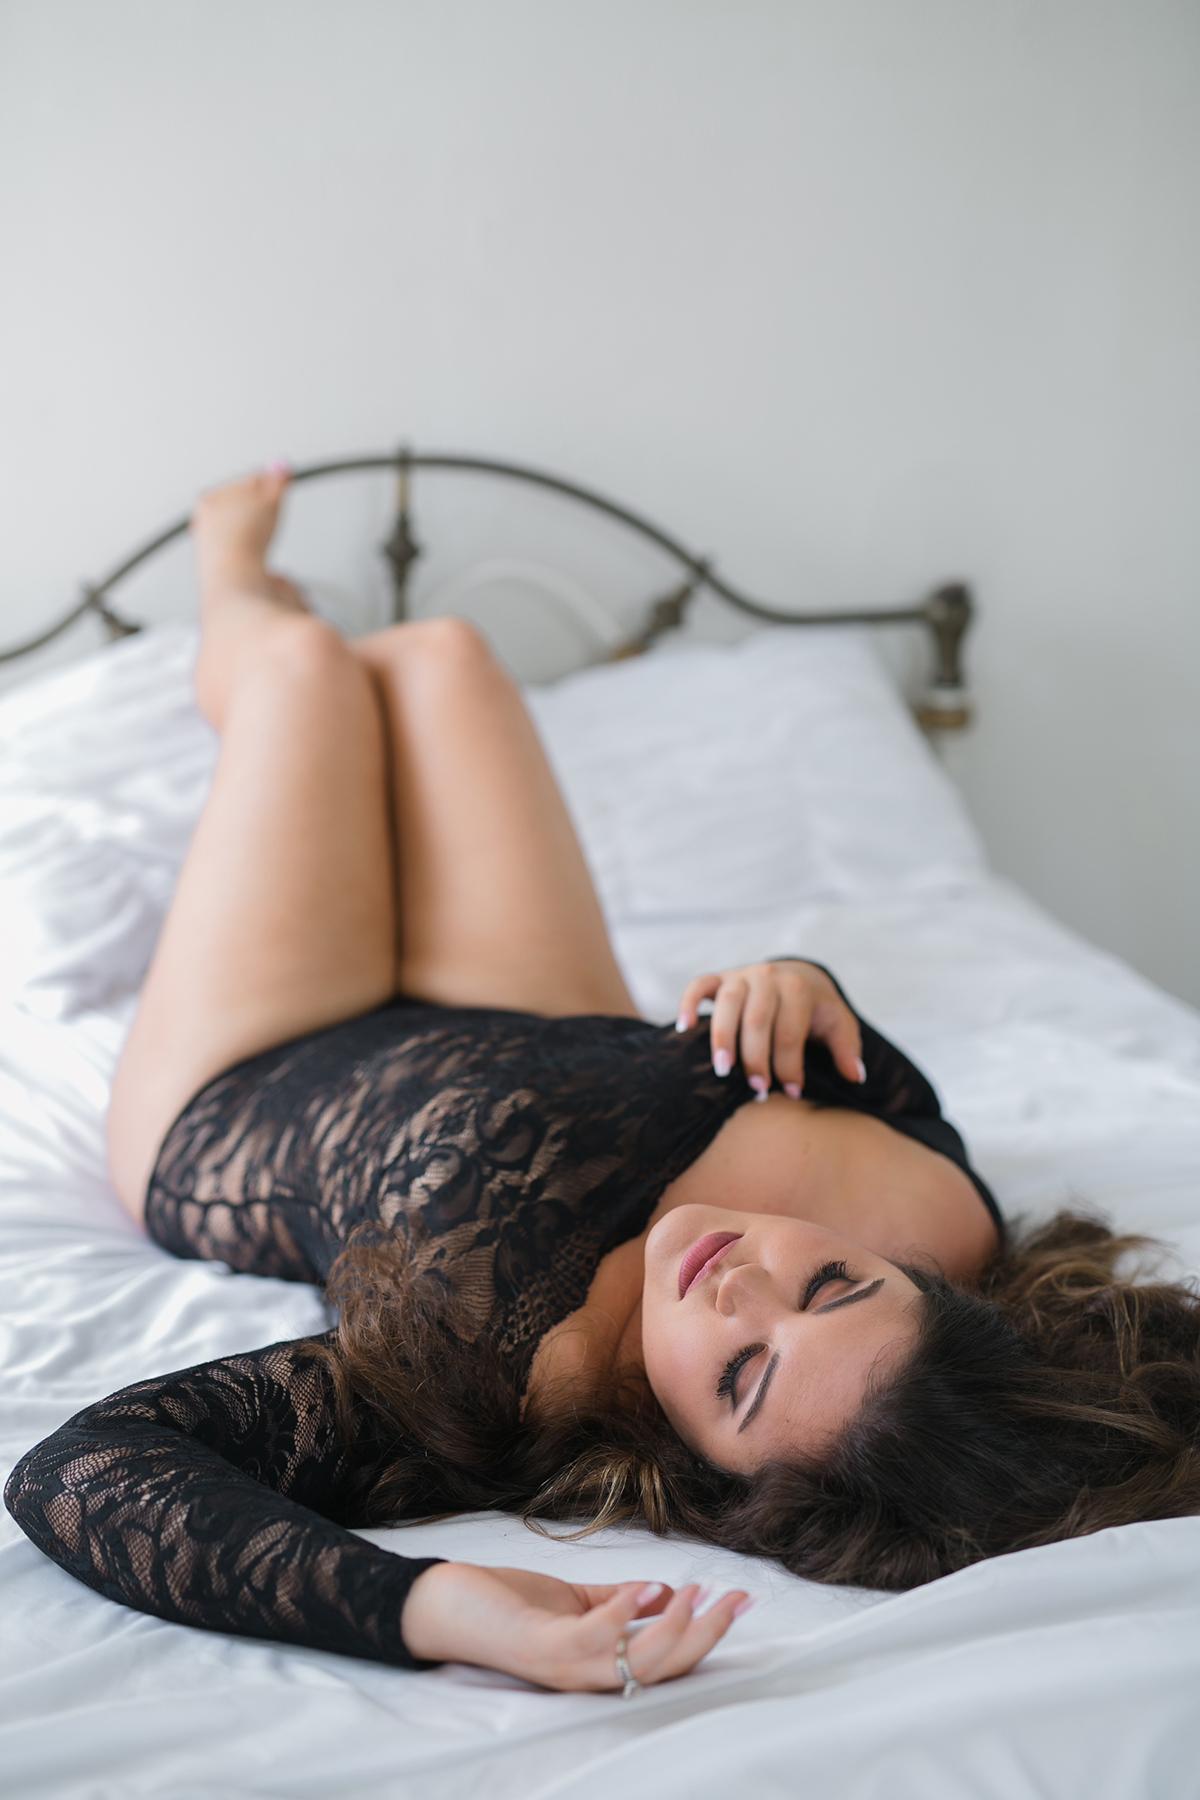 austin-tx-boudoir-photographer-photography-kimberly-brooke-22.jpg